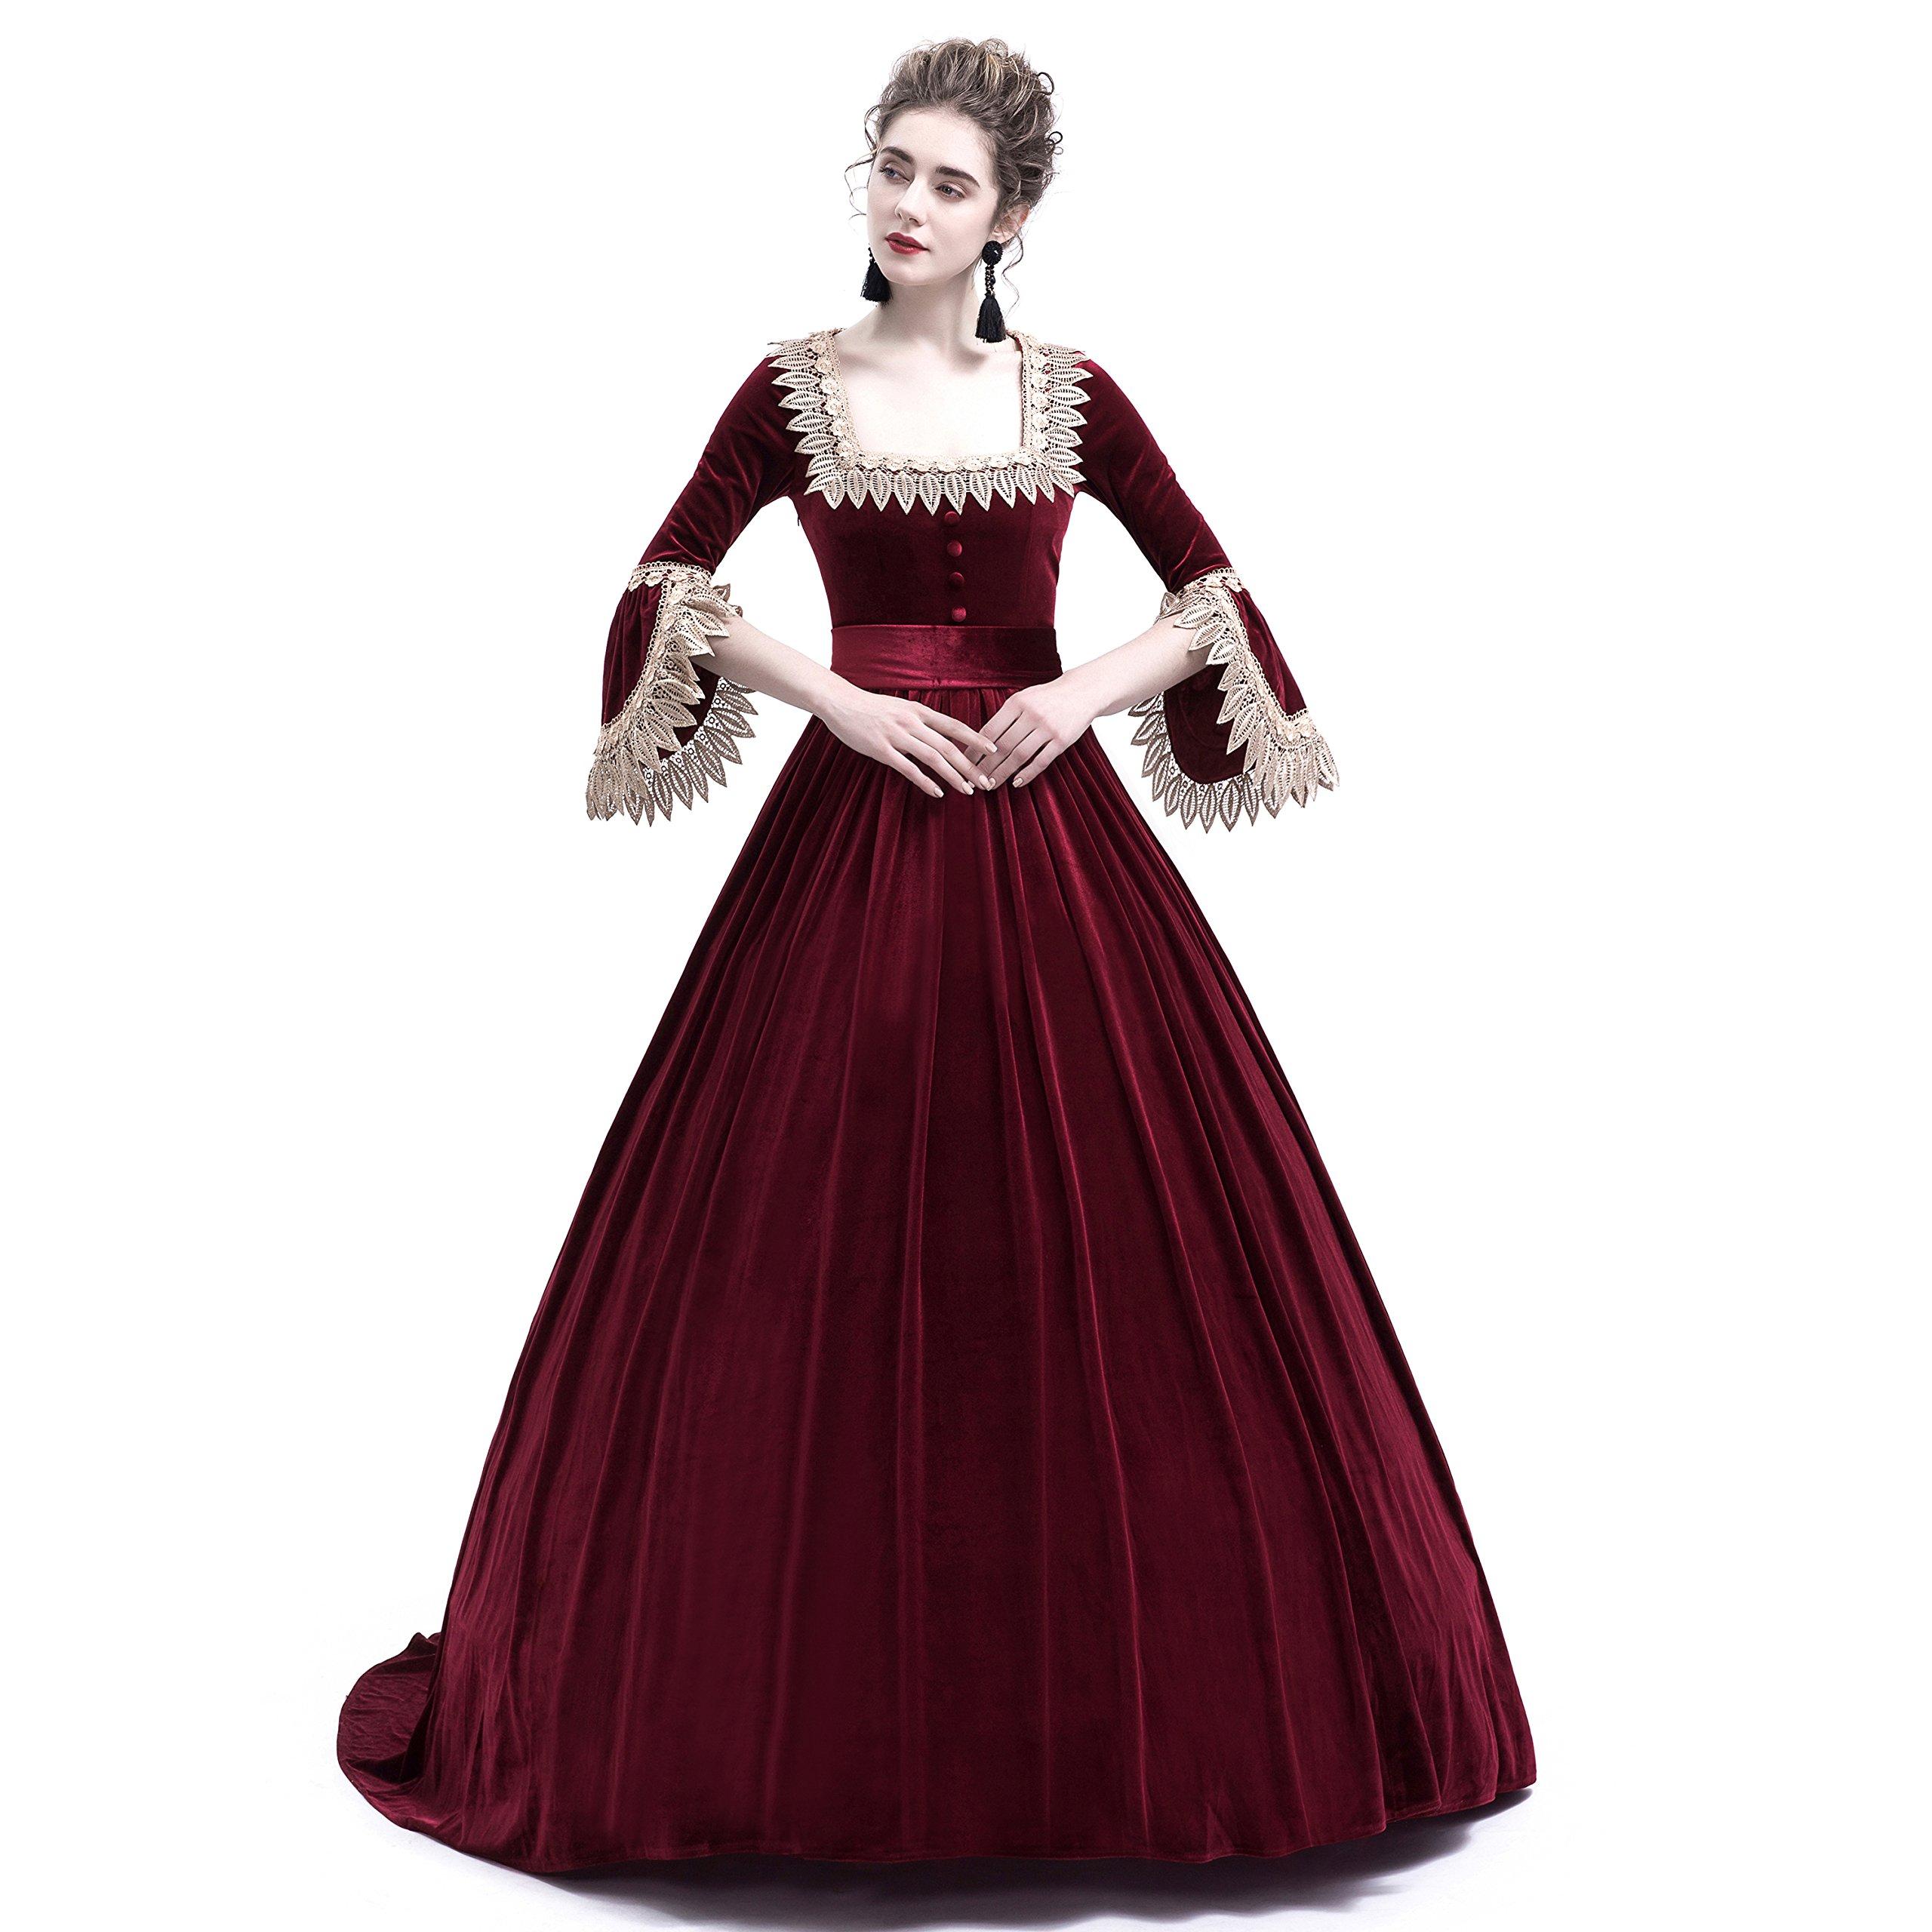 D-RoseBlooming Velvet Marie Antoinette Queen Theatrical Victorian Ball Gown Dress (Large, Red)